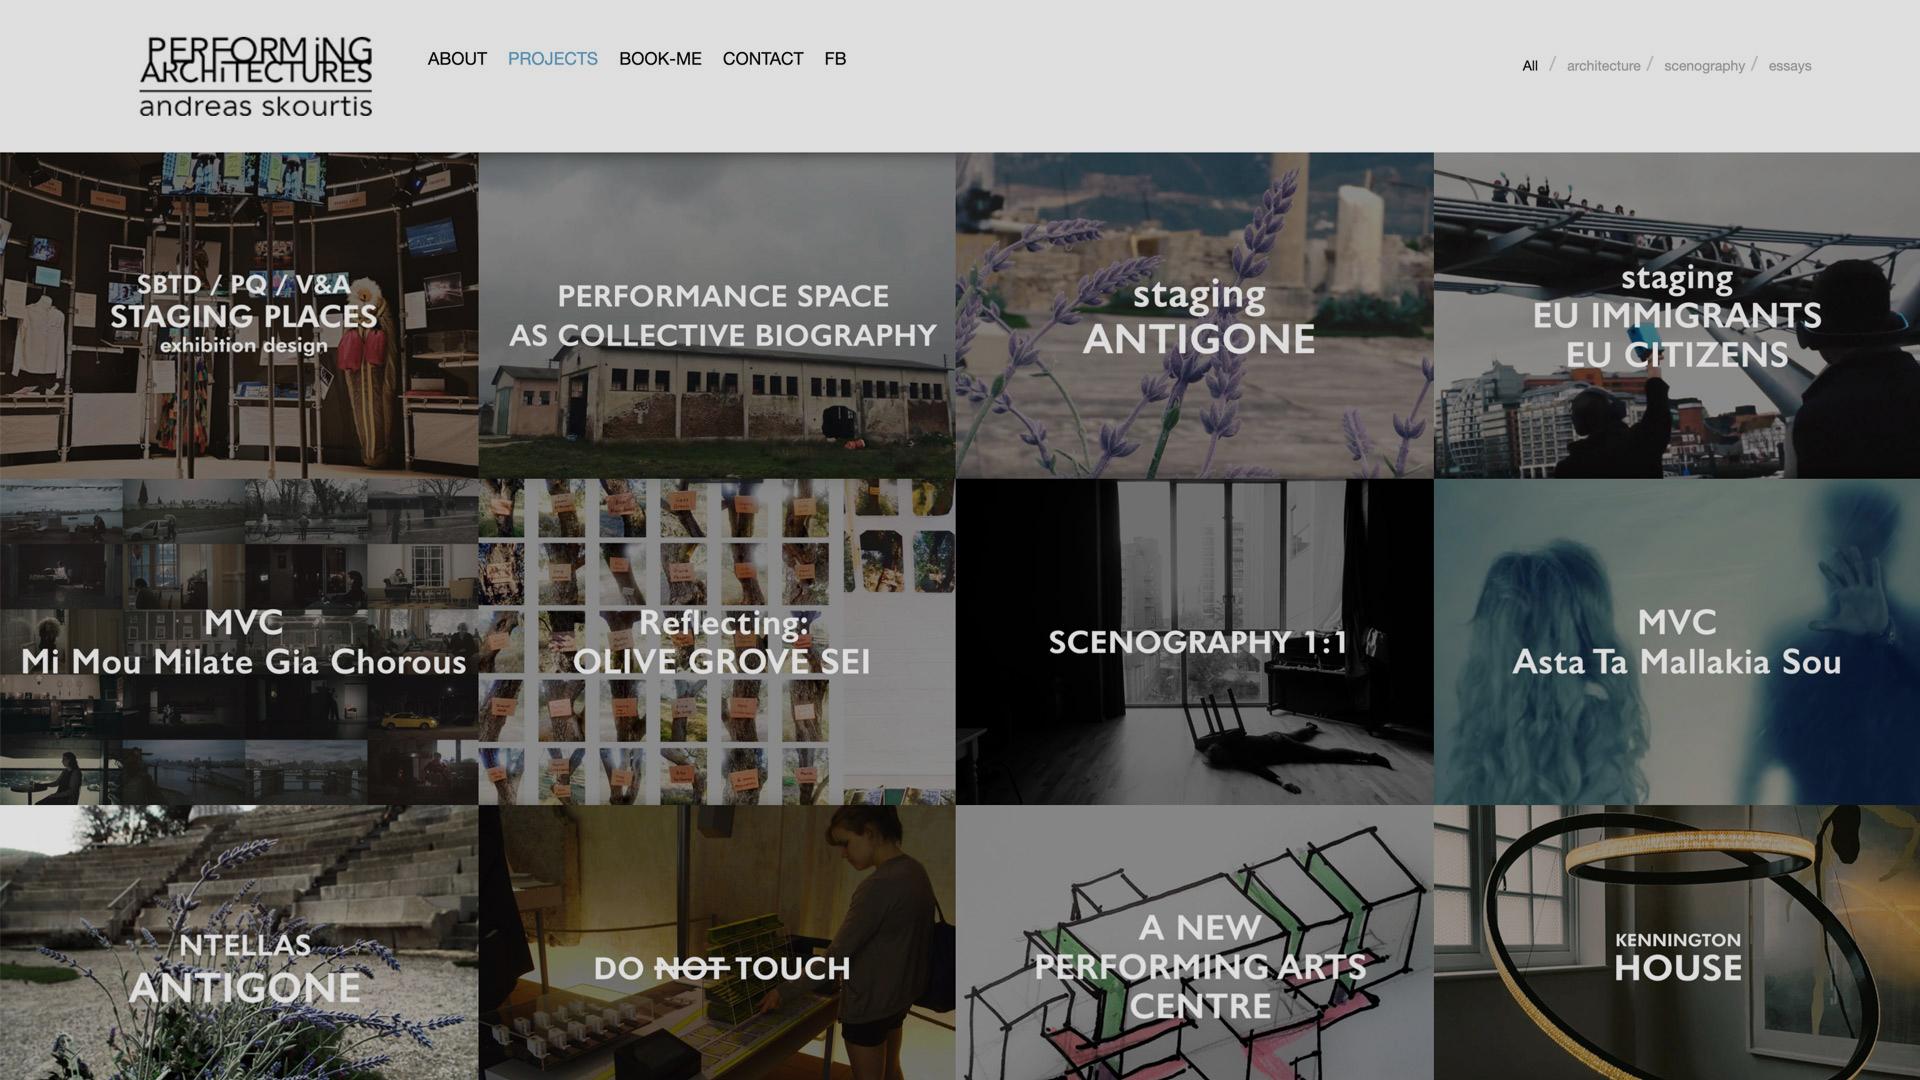 www.performingarchitectures.com